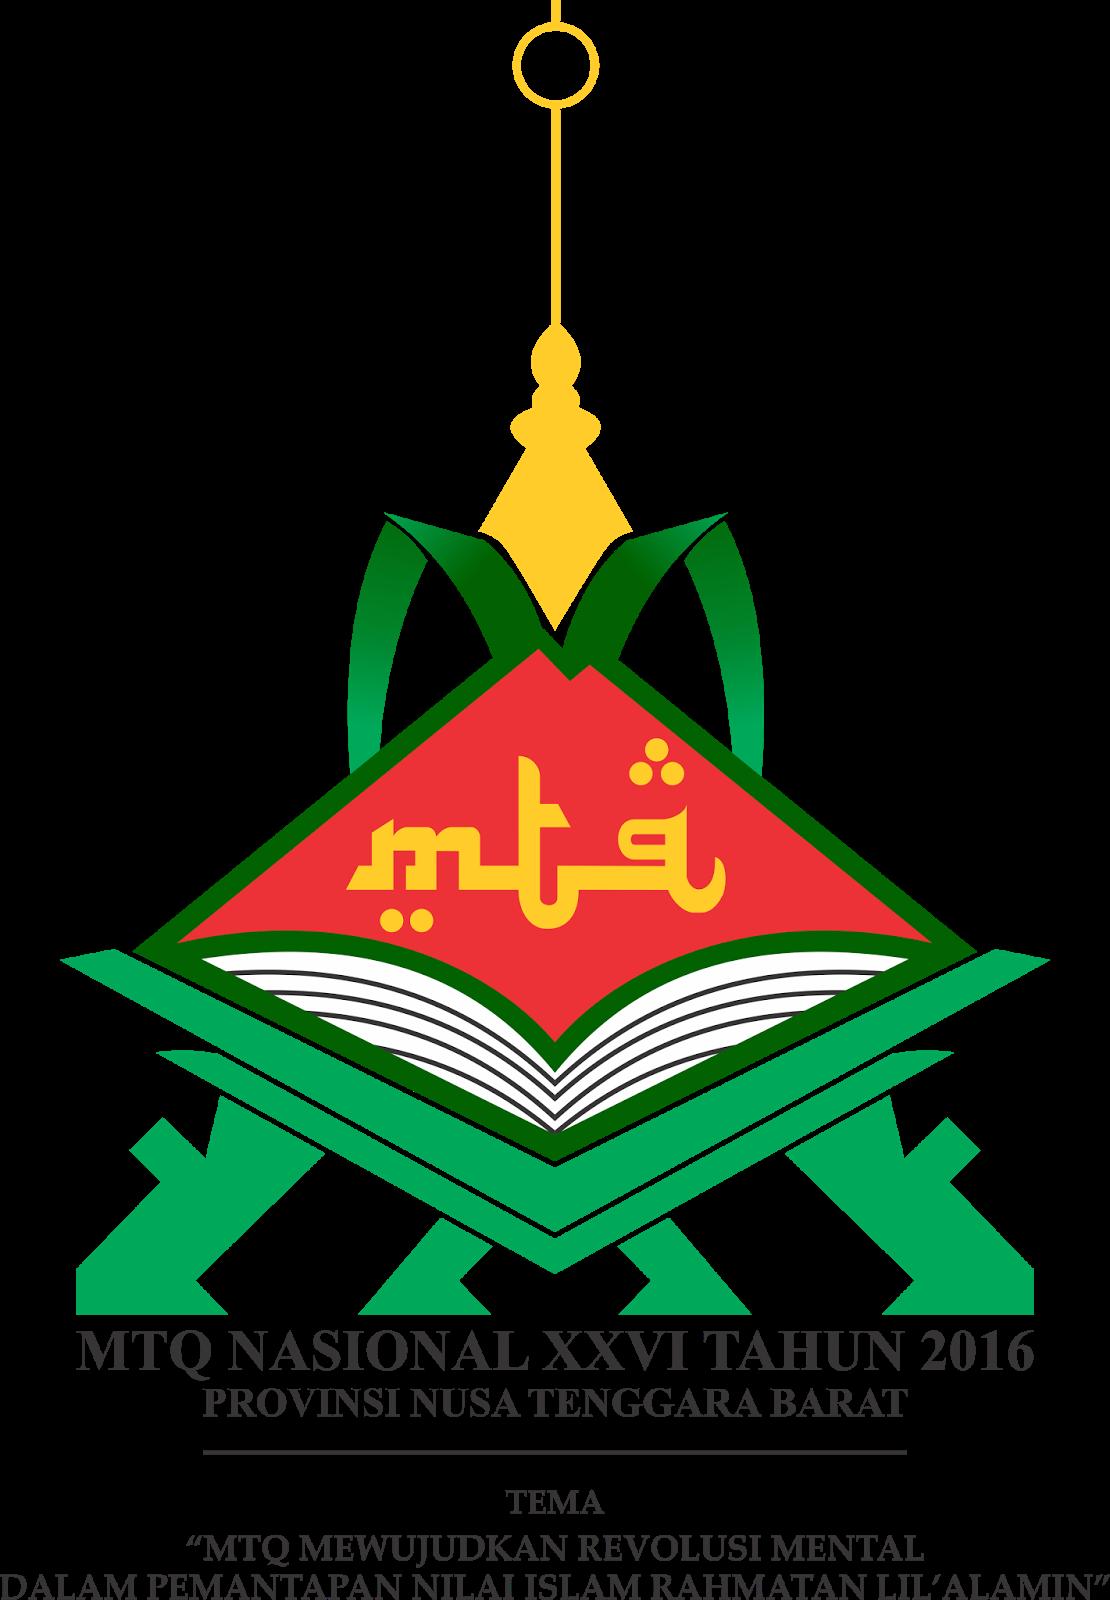 Logo Lptq Png : Lombok, Atraktif:, Pengurus, Se-Indonesia, Puasa, Bersama, Pendopo, Gubernur